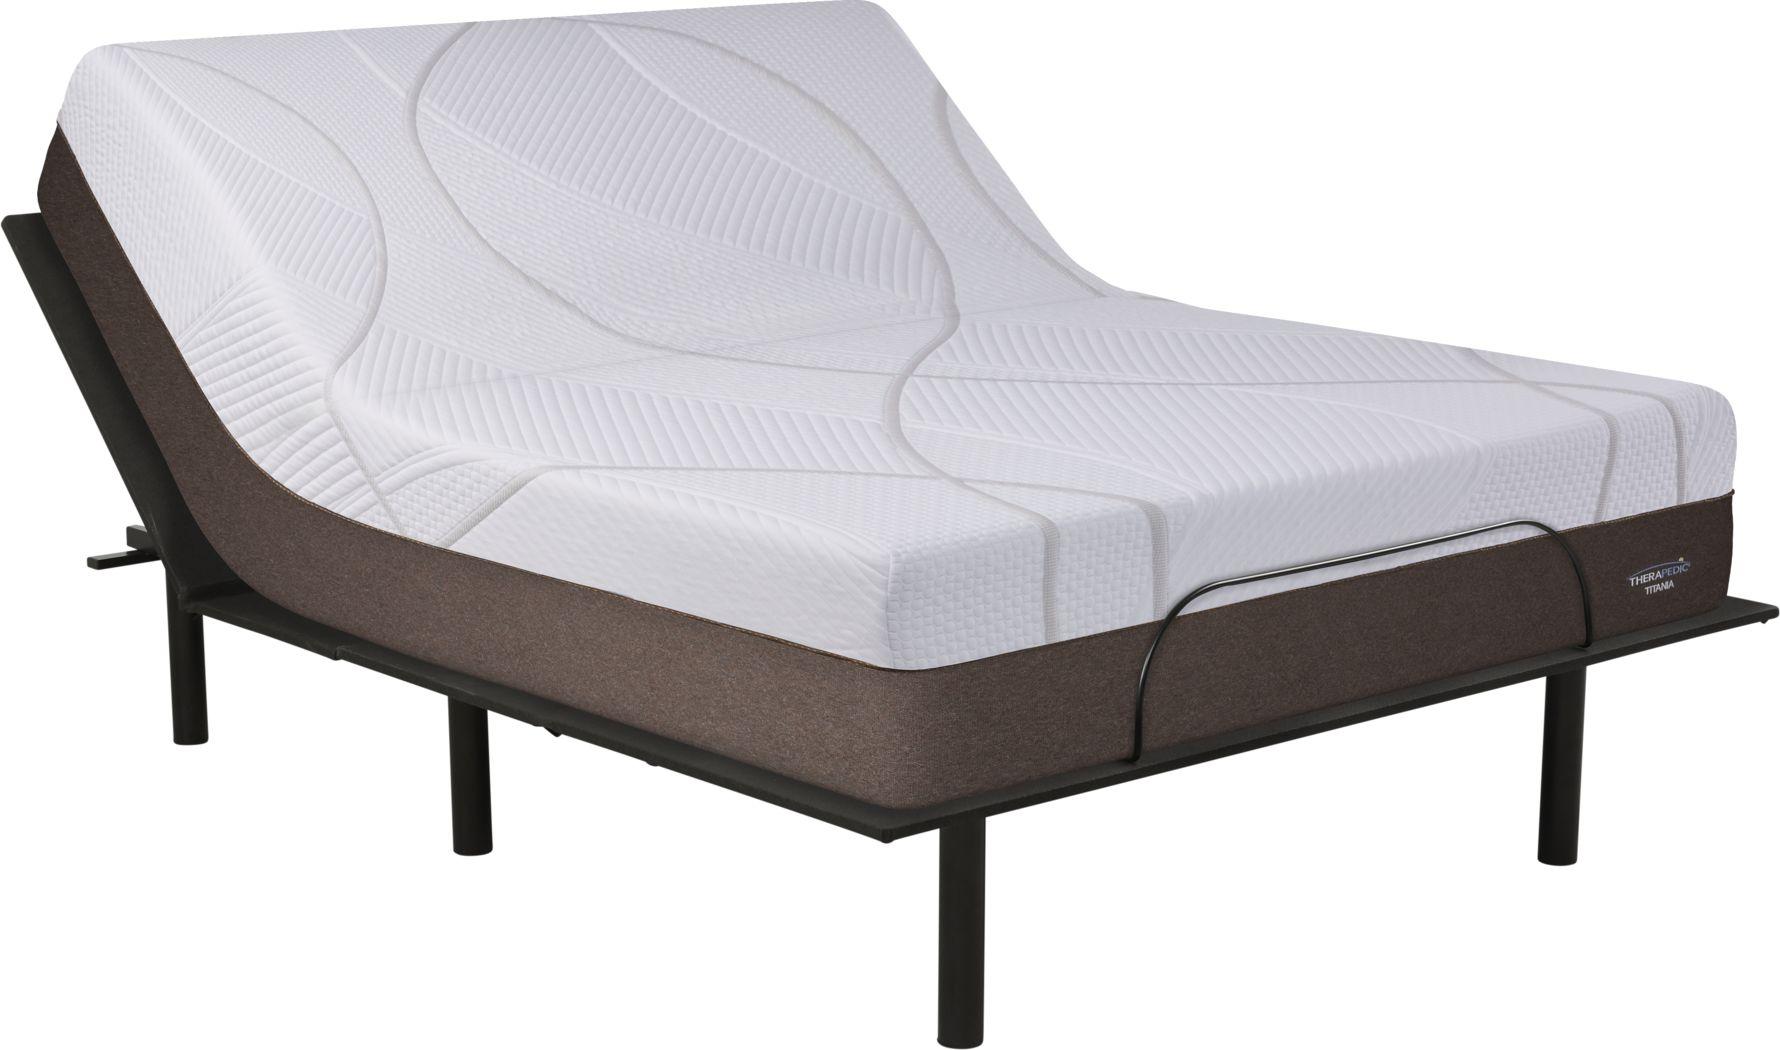 Therapedic Titania King Mattress with RTG Sleep 2000 Adjustable Base